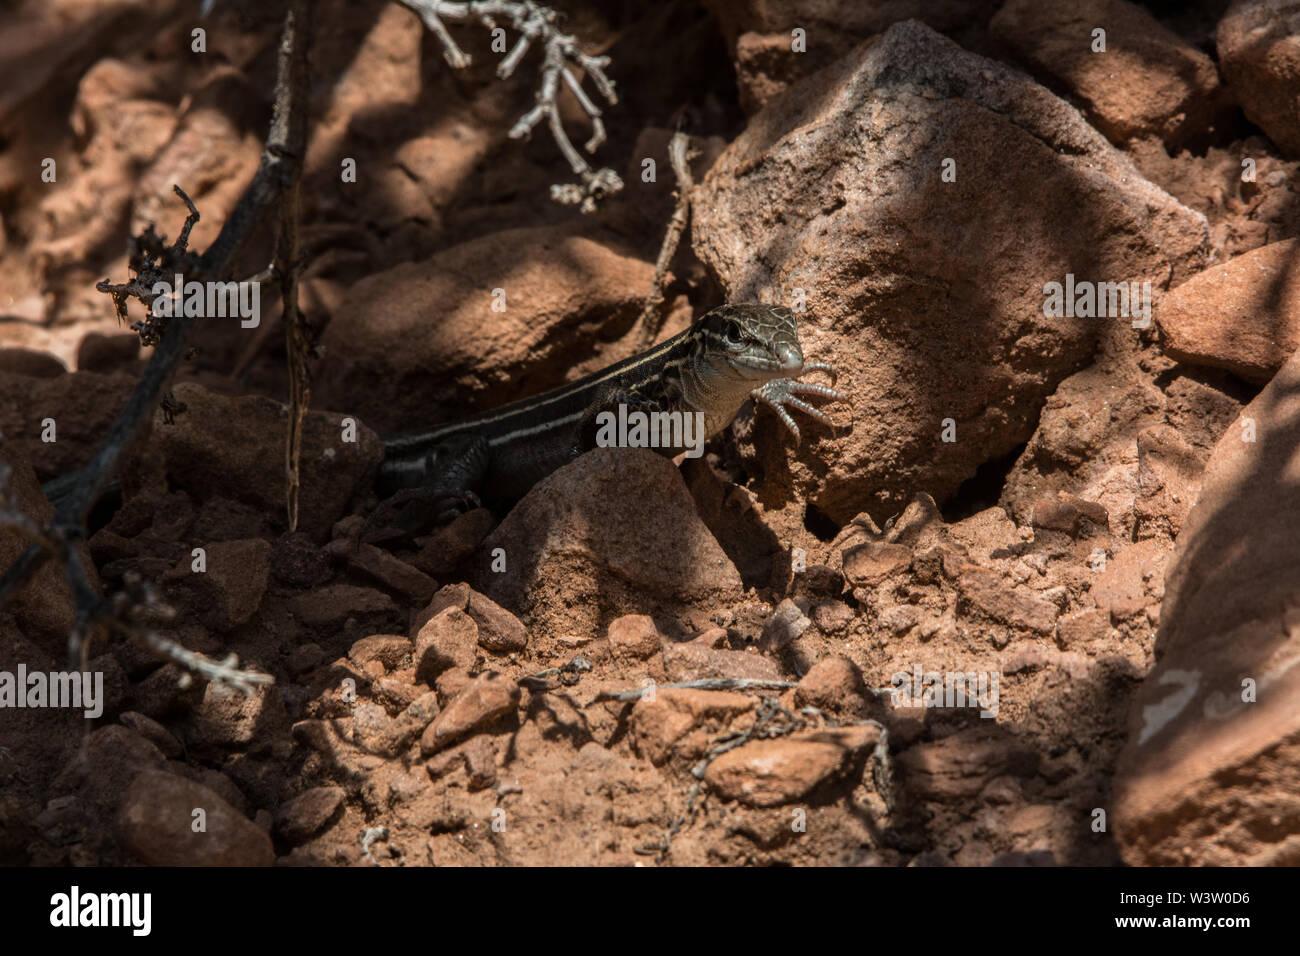 Plateau Striped Whiptail (Aspidoscelis velox) from Mesa County, Colorado, USA. Stock Photo